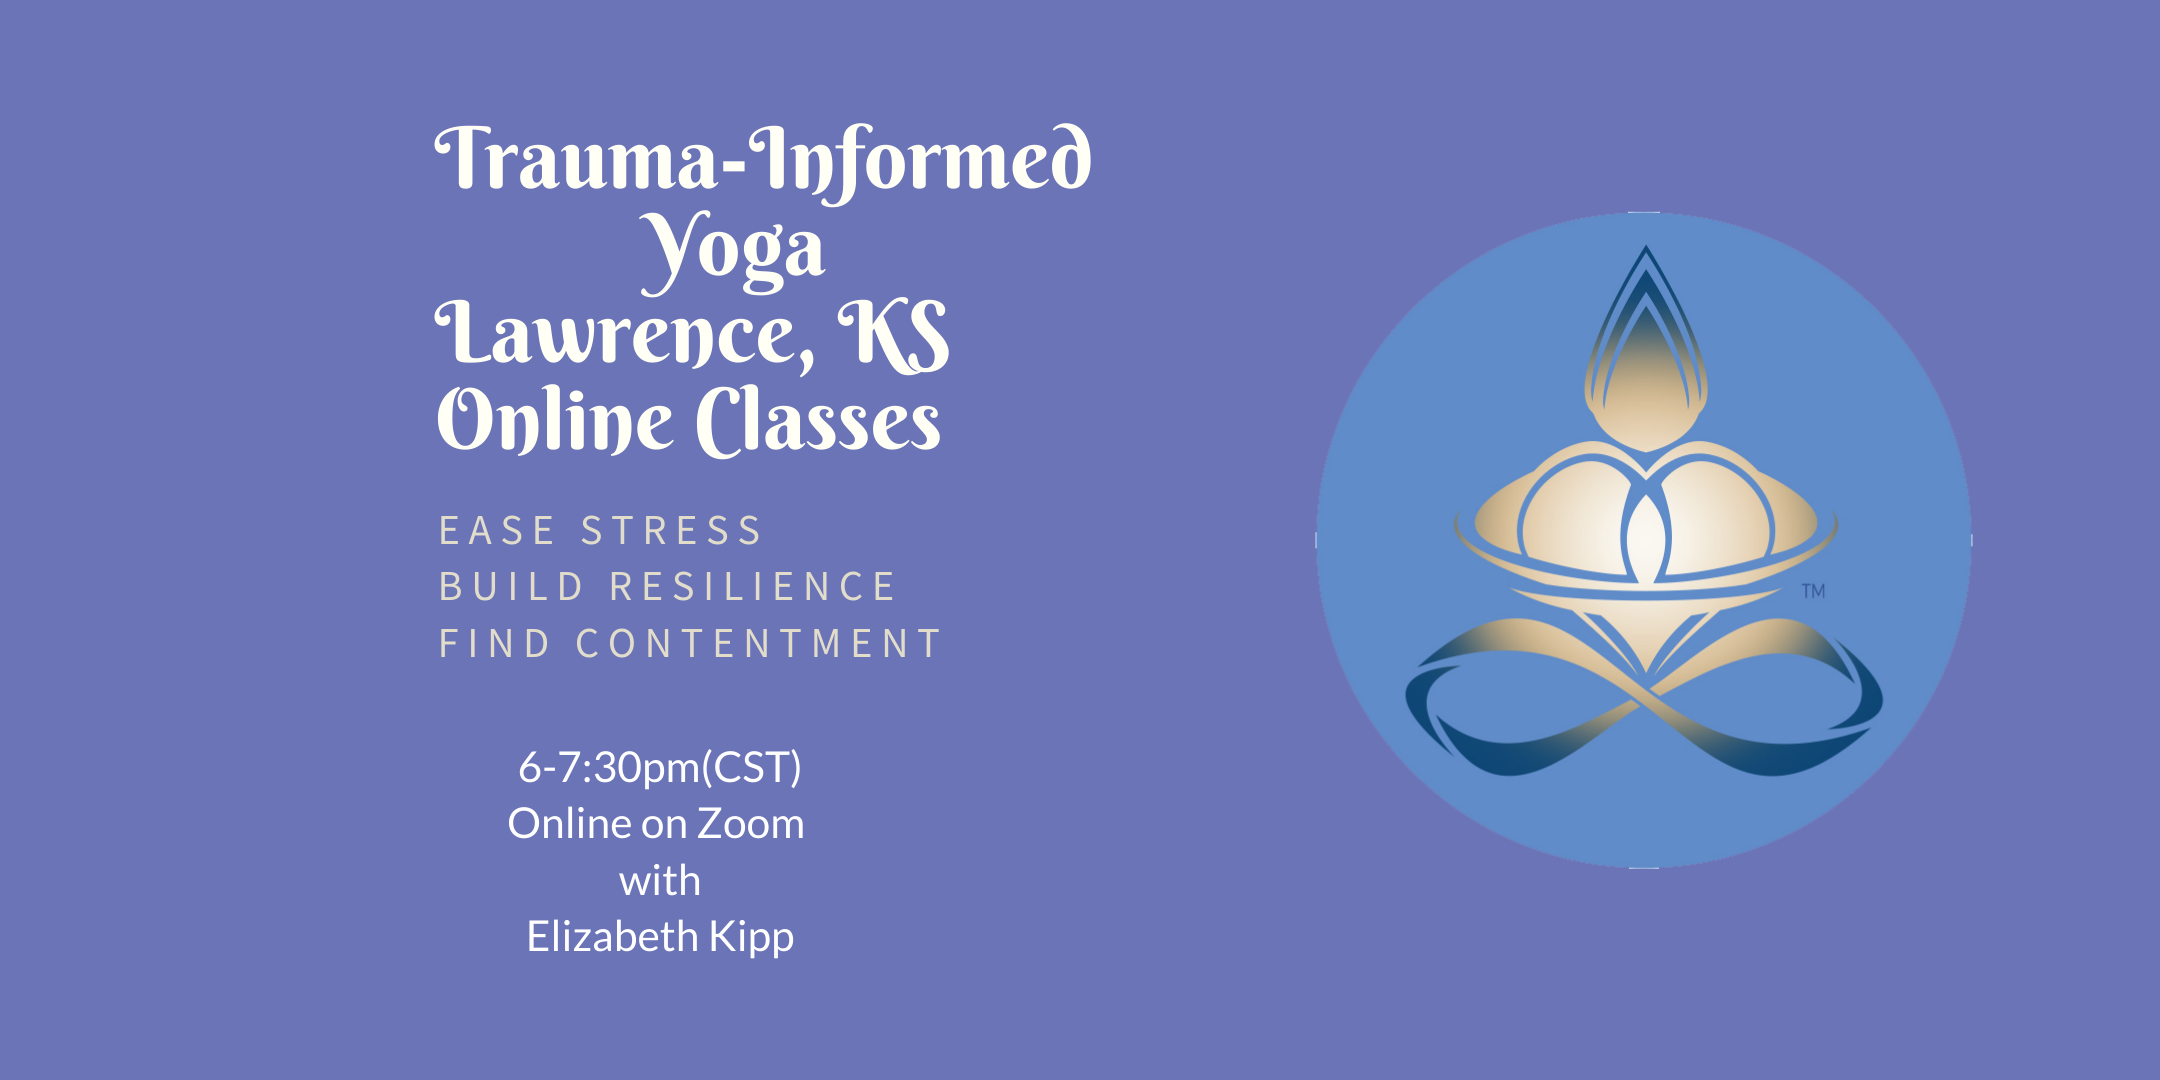 Trauma-Informed Yoga, Lawrence, KS Online Classes (1).png